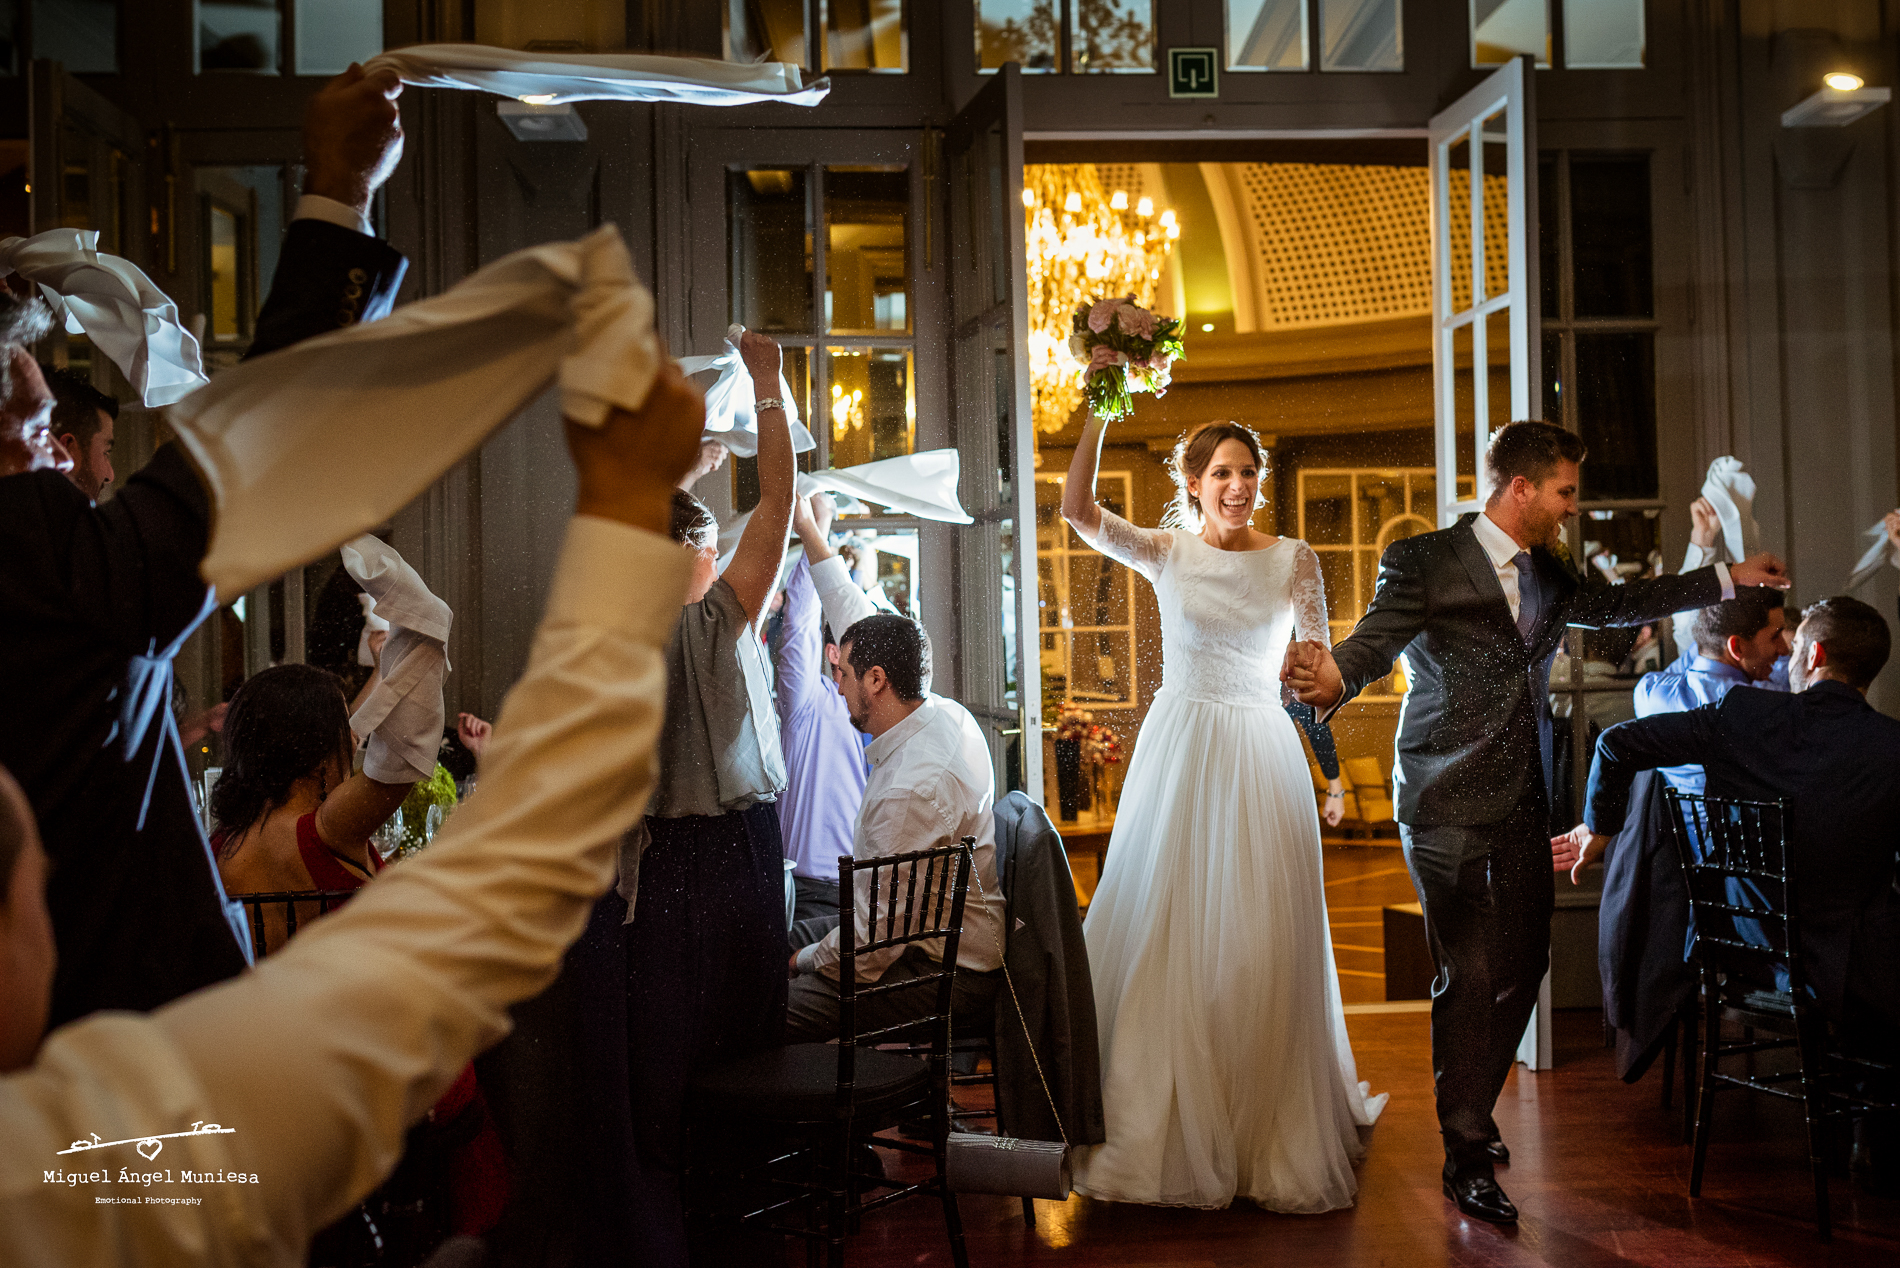 miguel angel muniesa, fotografo boda Teruel, fotografo boda navarra, fotografo boda zaragoza, fotografo boda soria, miguel angel muniesa emotional photography_22